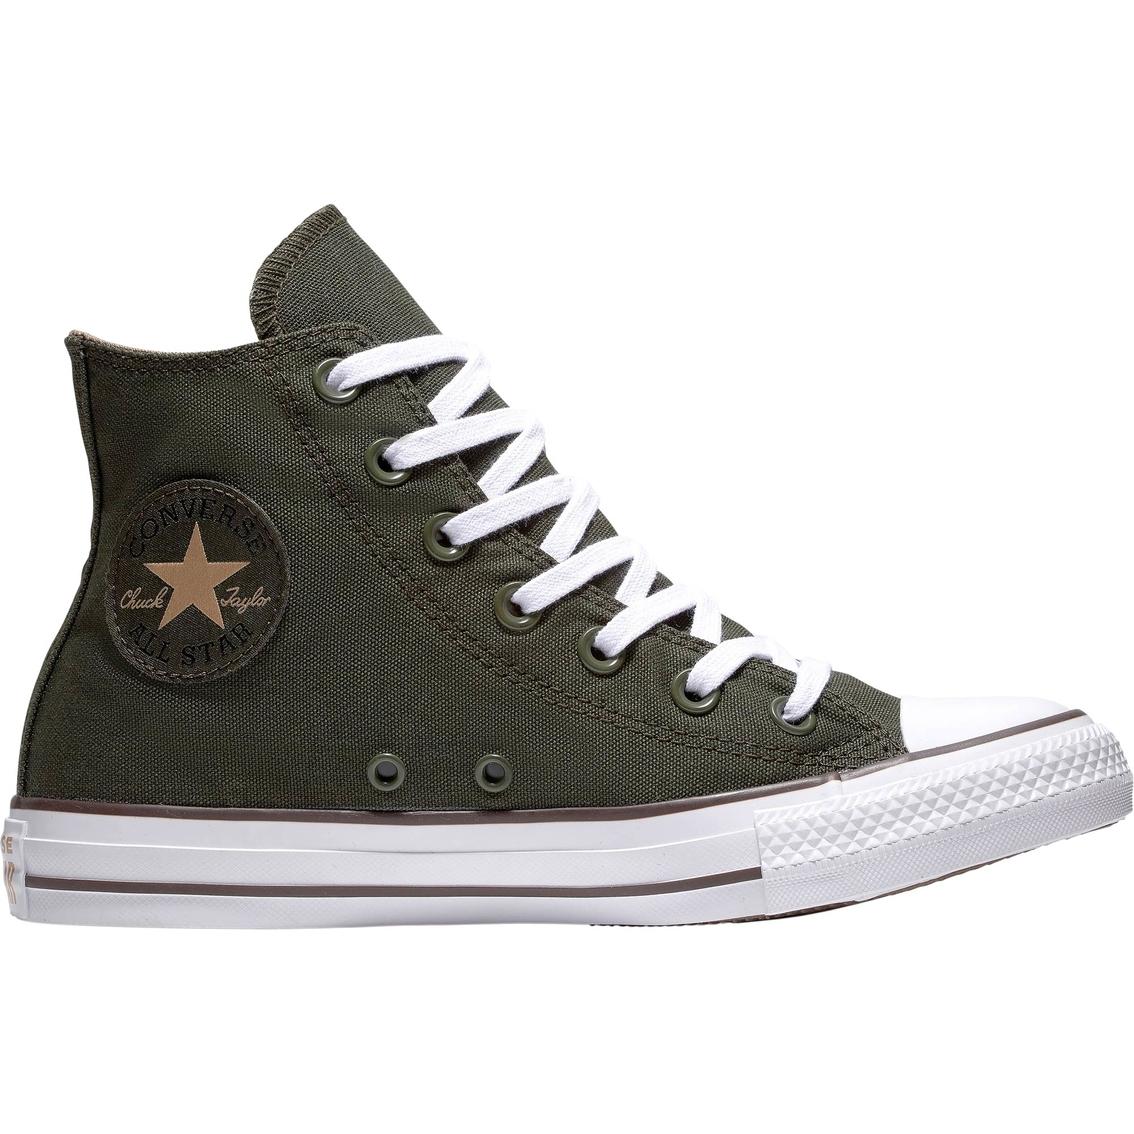 7e3b353aa7f7 Converse Men s Chuck Taylor All Star High Top Utility Shoes ...